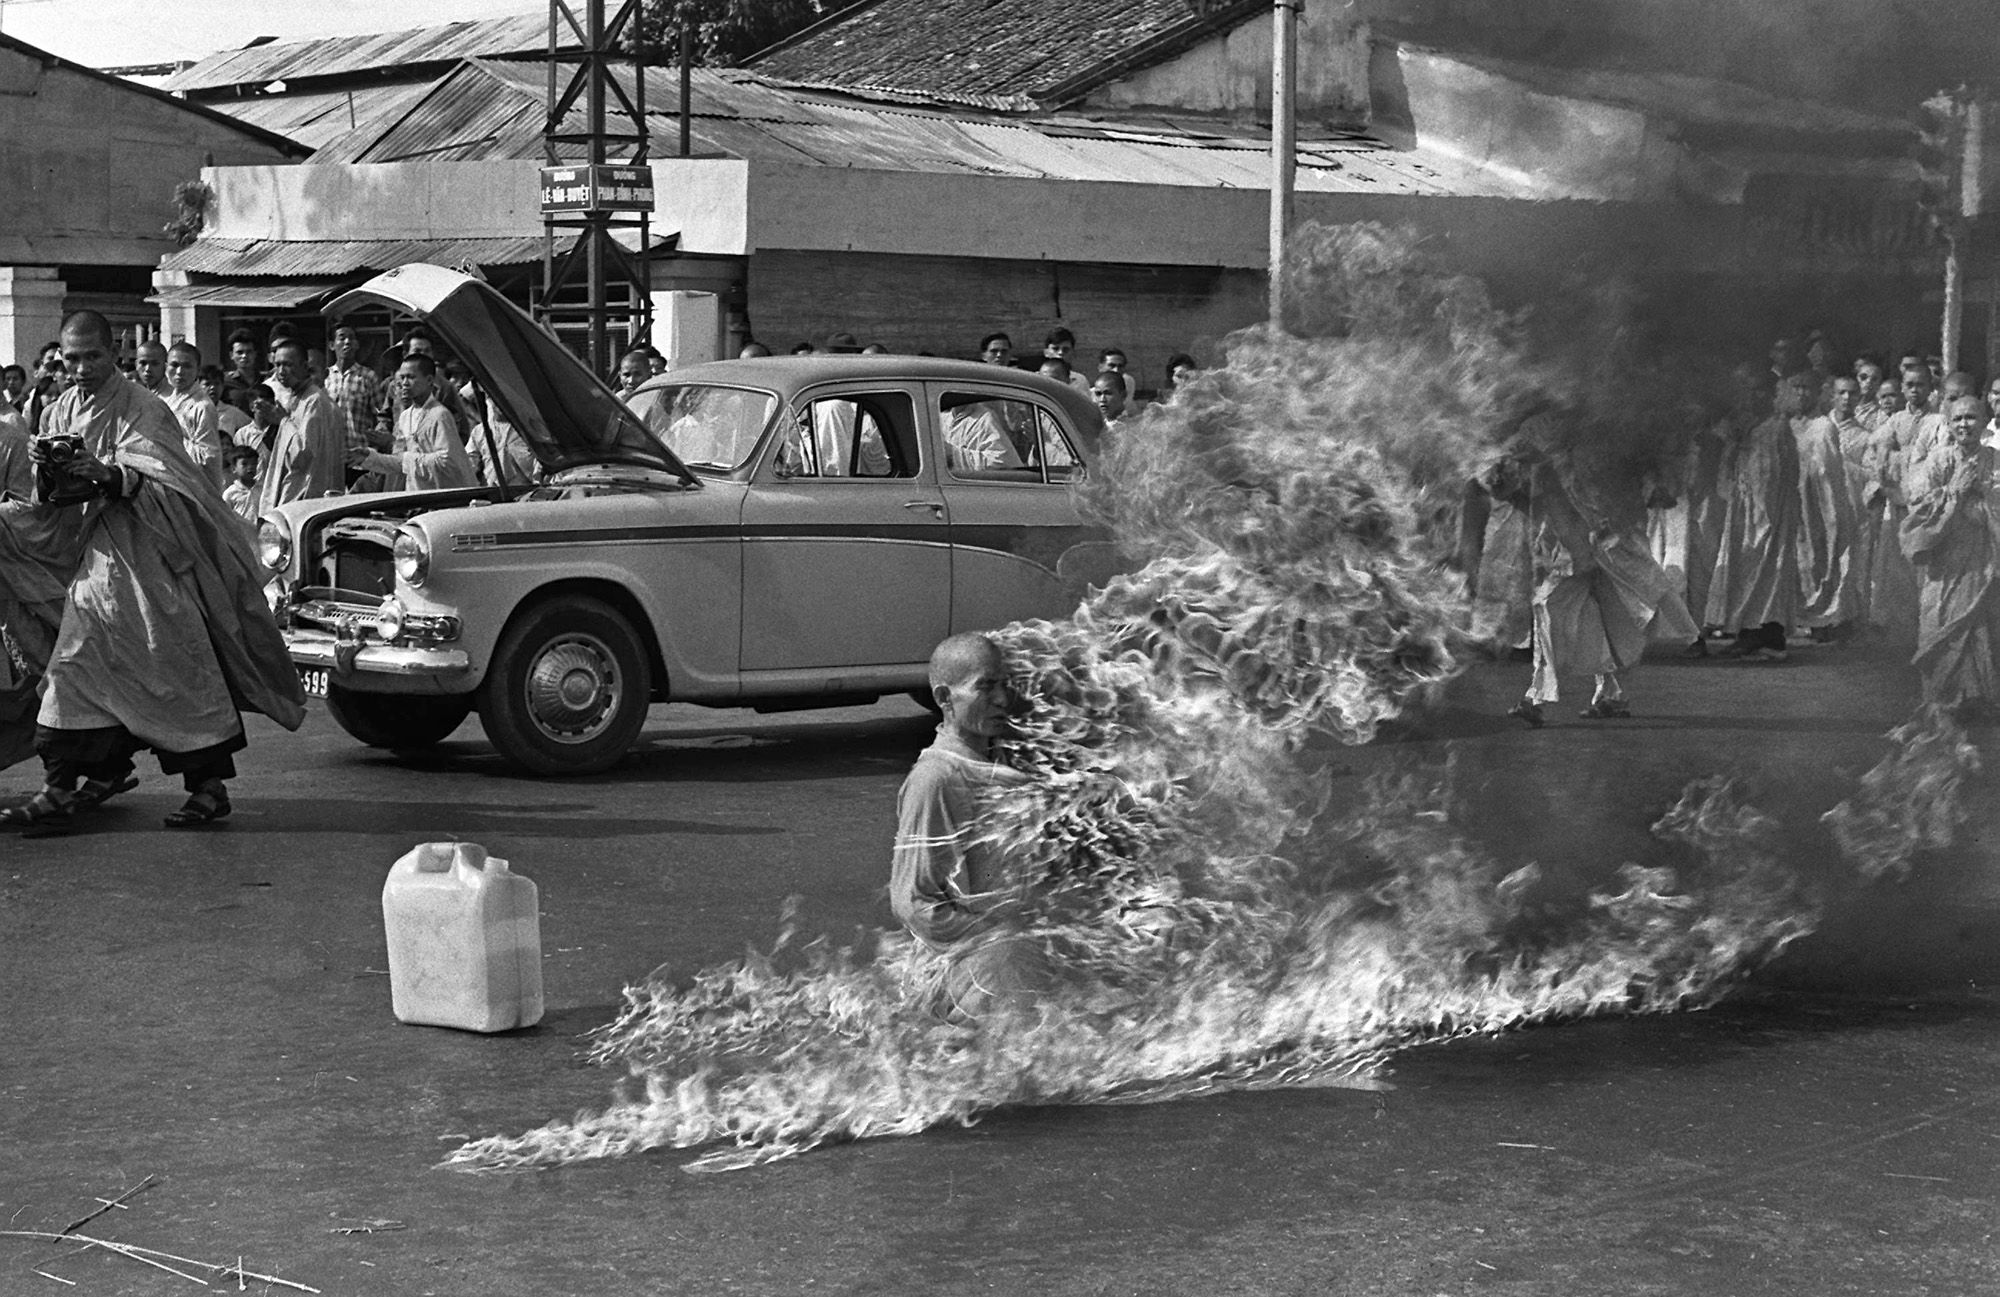 ba-232-monje-budista-inmolandose-en-saigon-1963